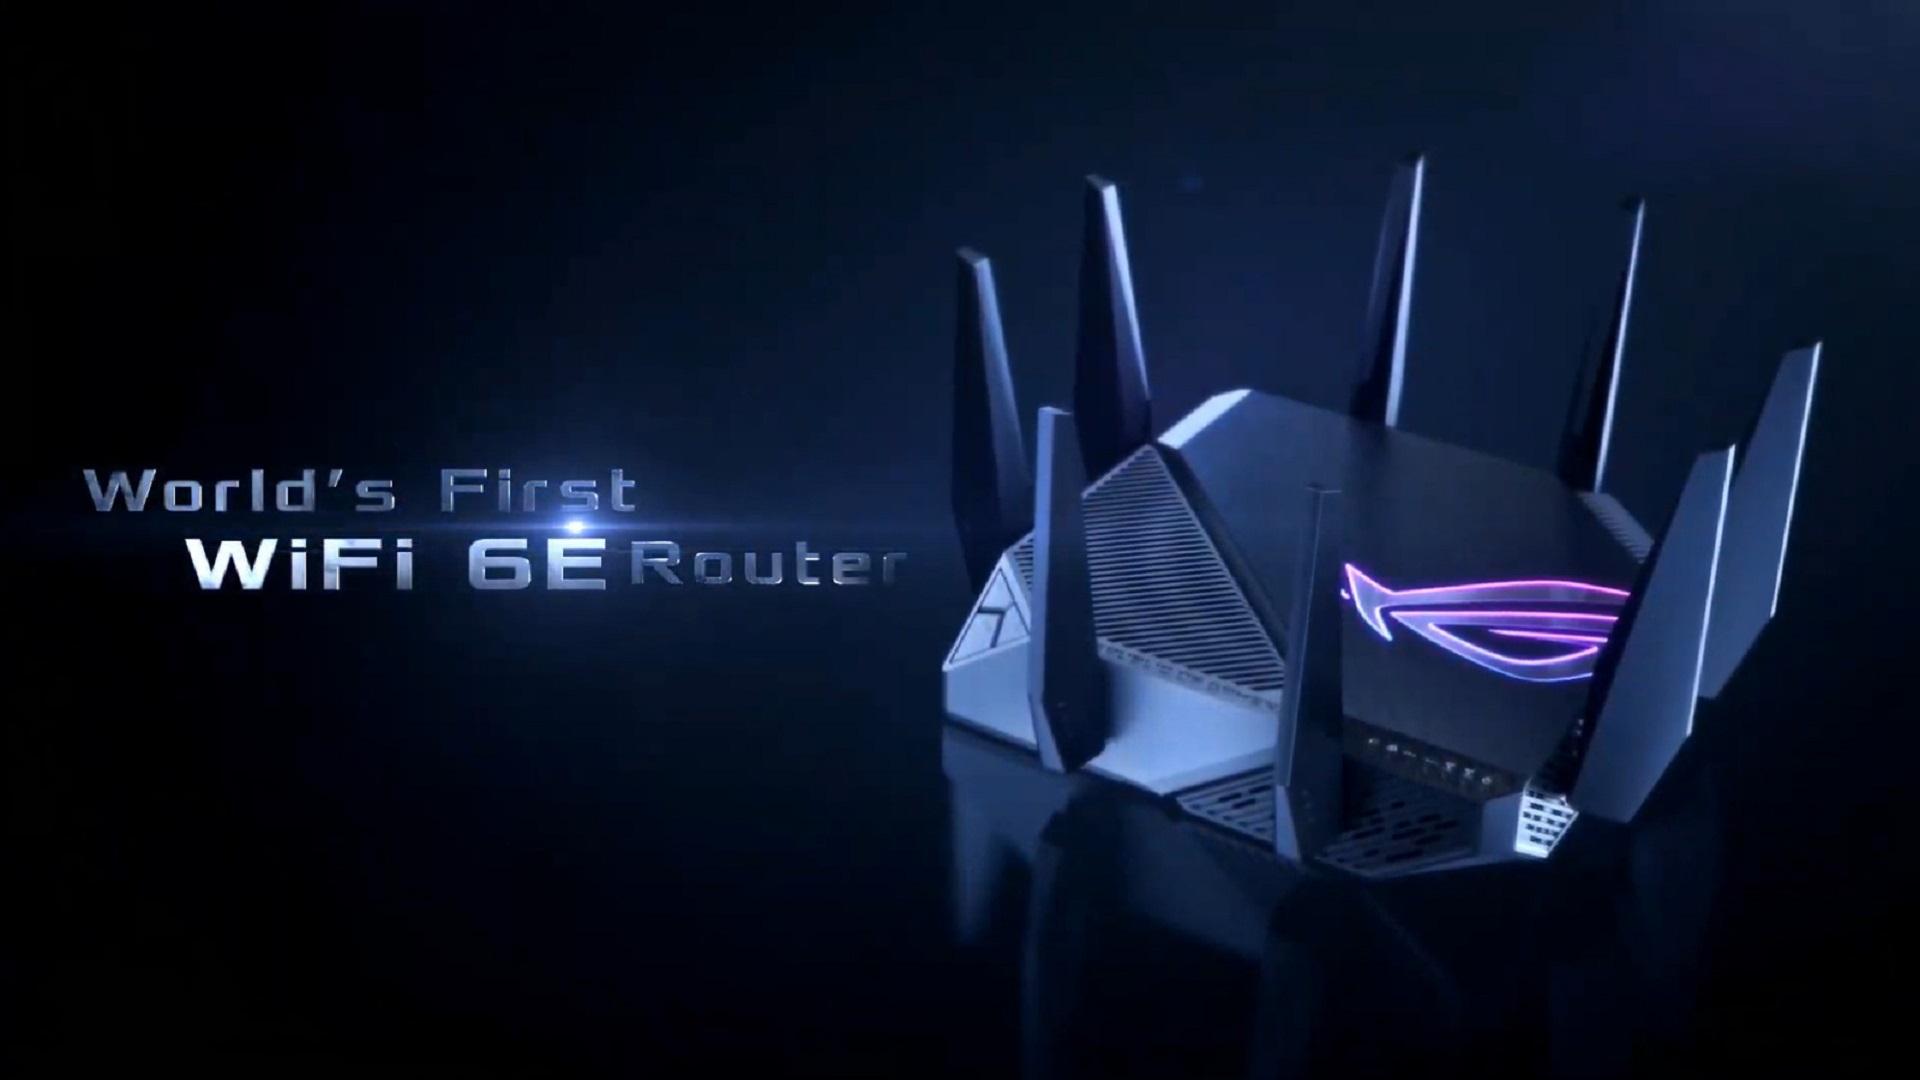 02_asus_rog_rapture_gt_axe11000_pierwszy_router_z_obsluga_wifi_6e_6_b-jpg.12636